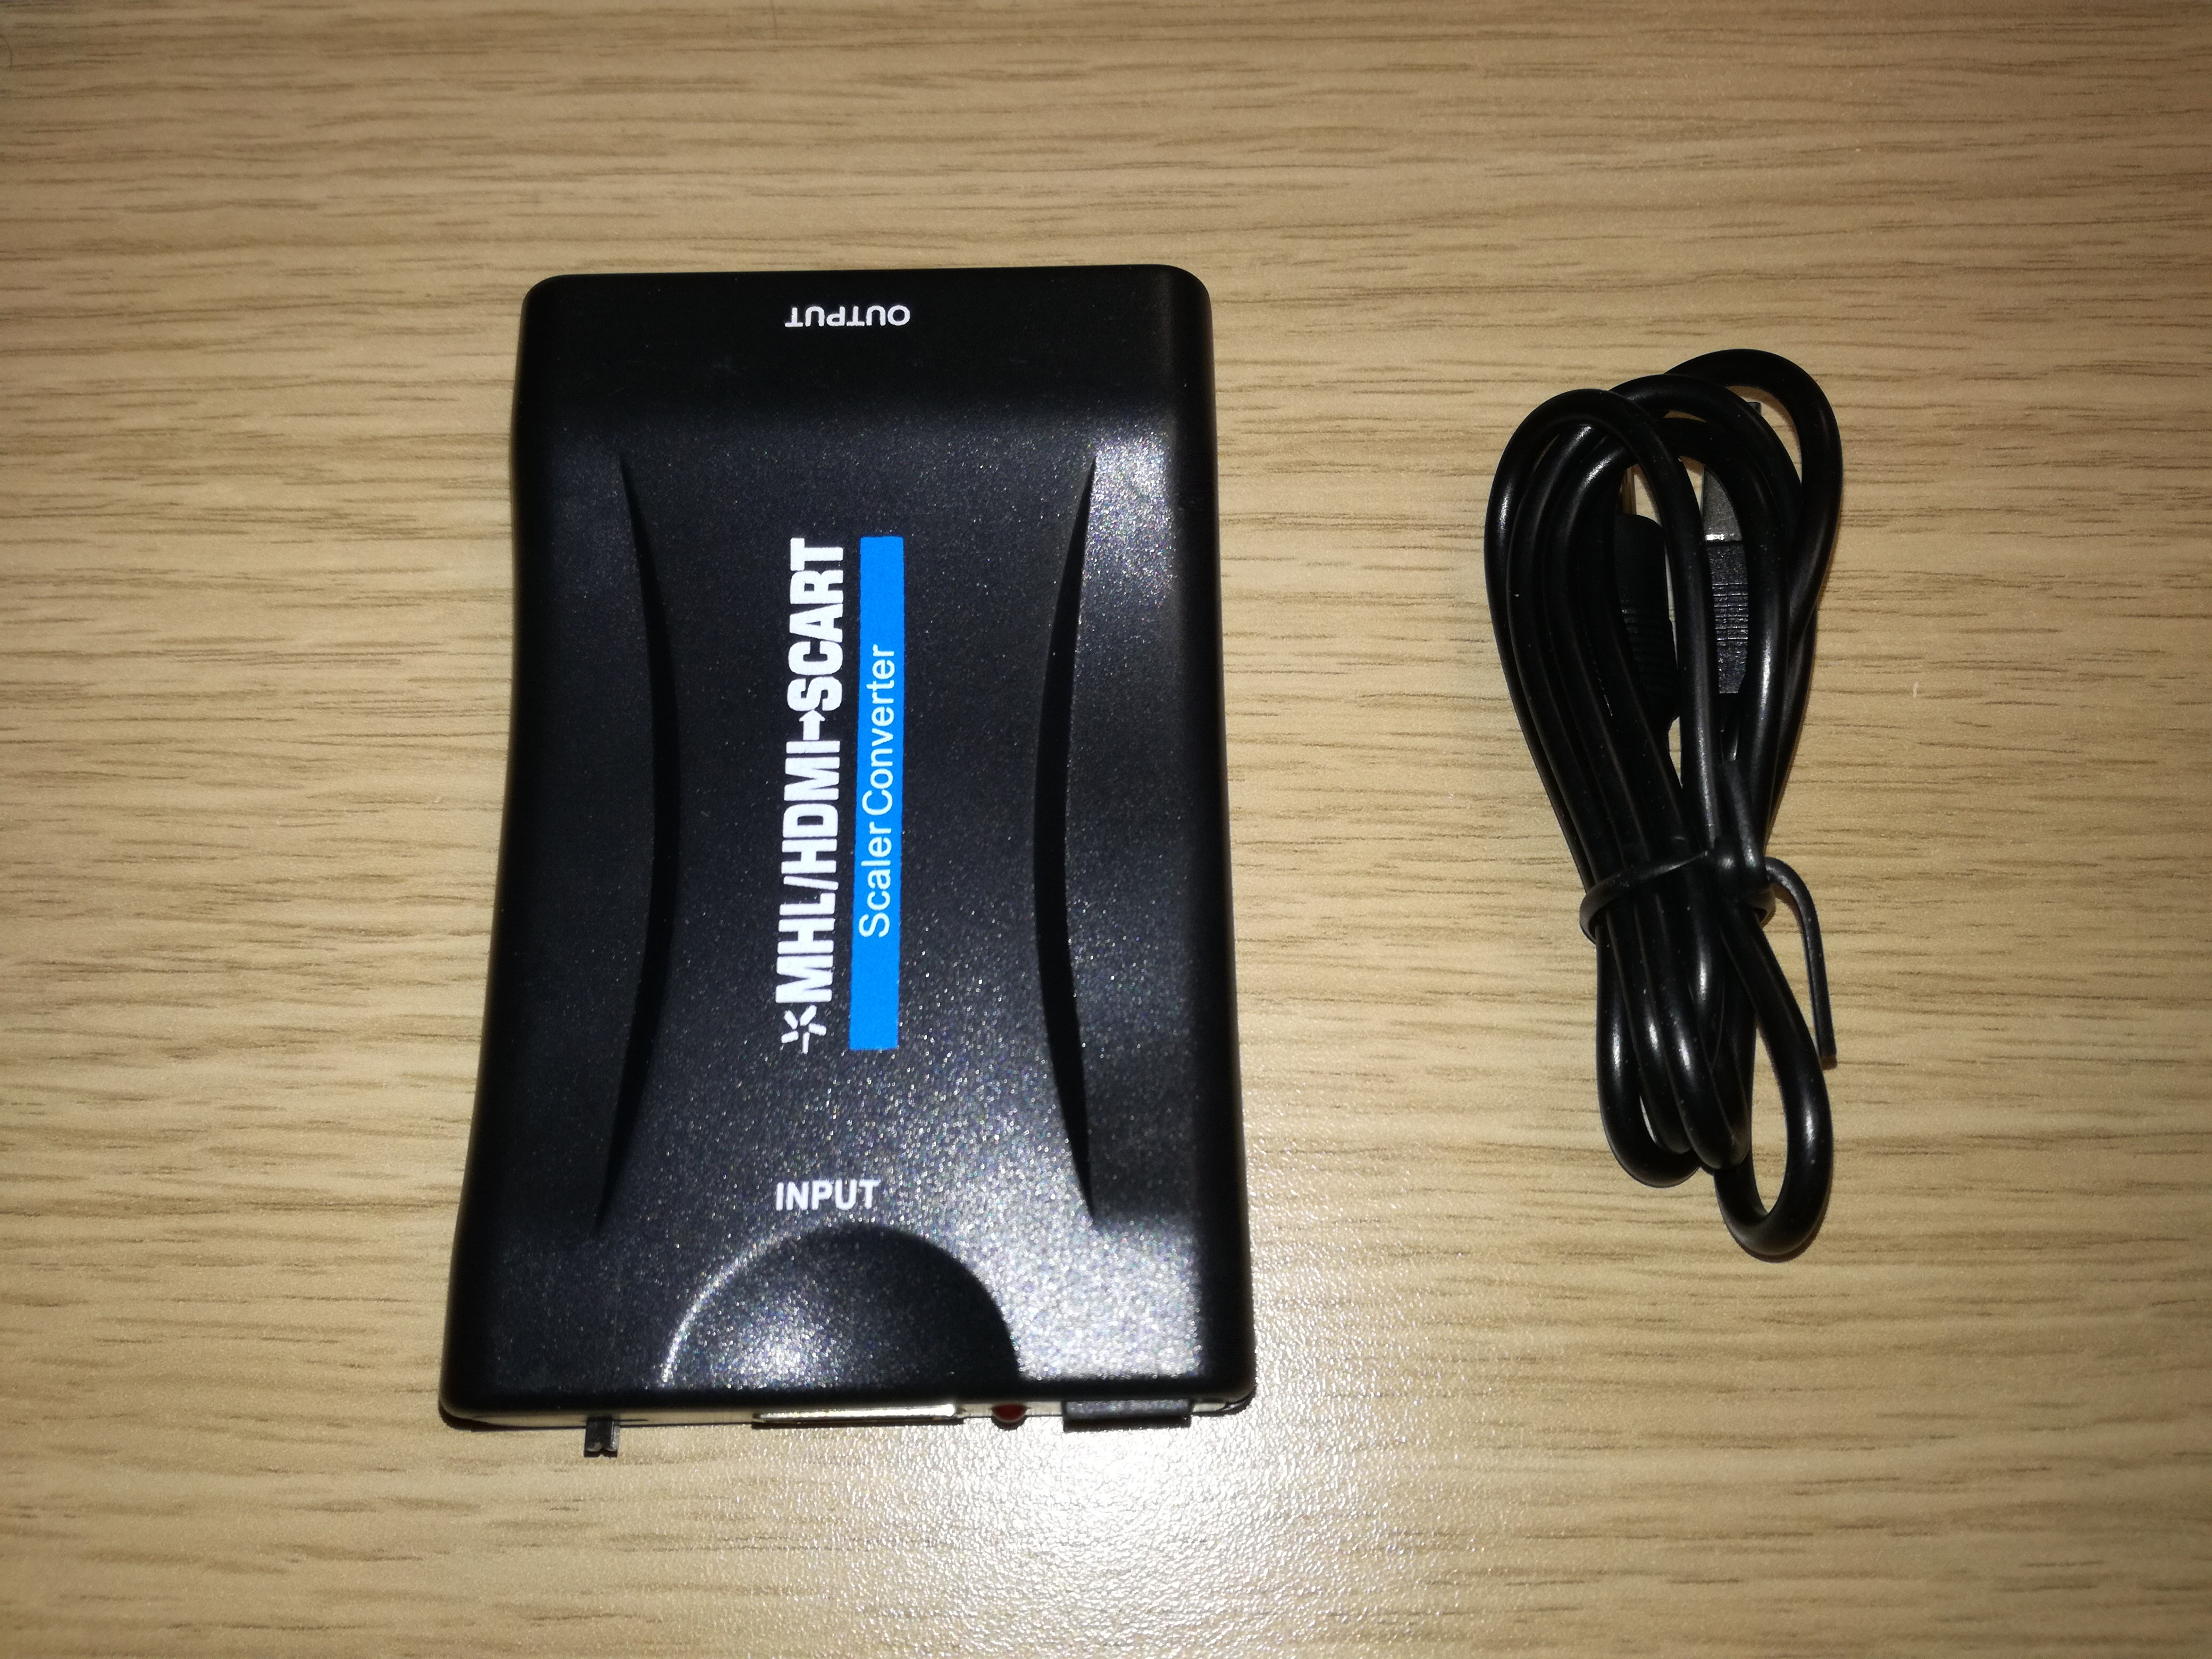 Conversor de HDMI a Euroconector